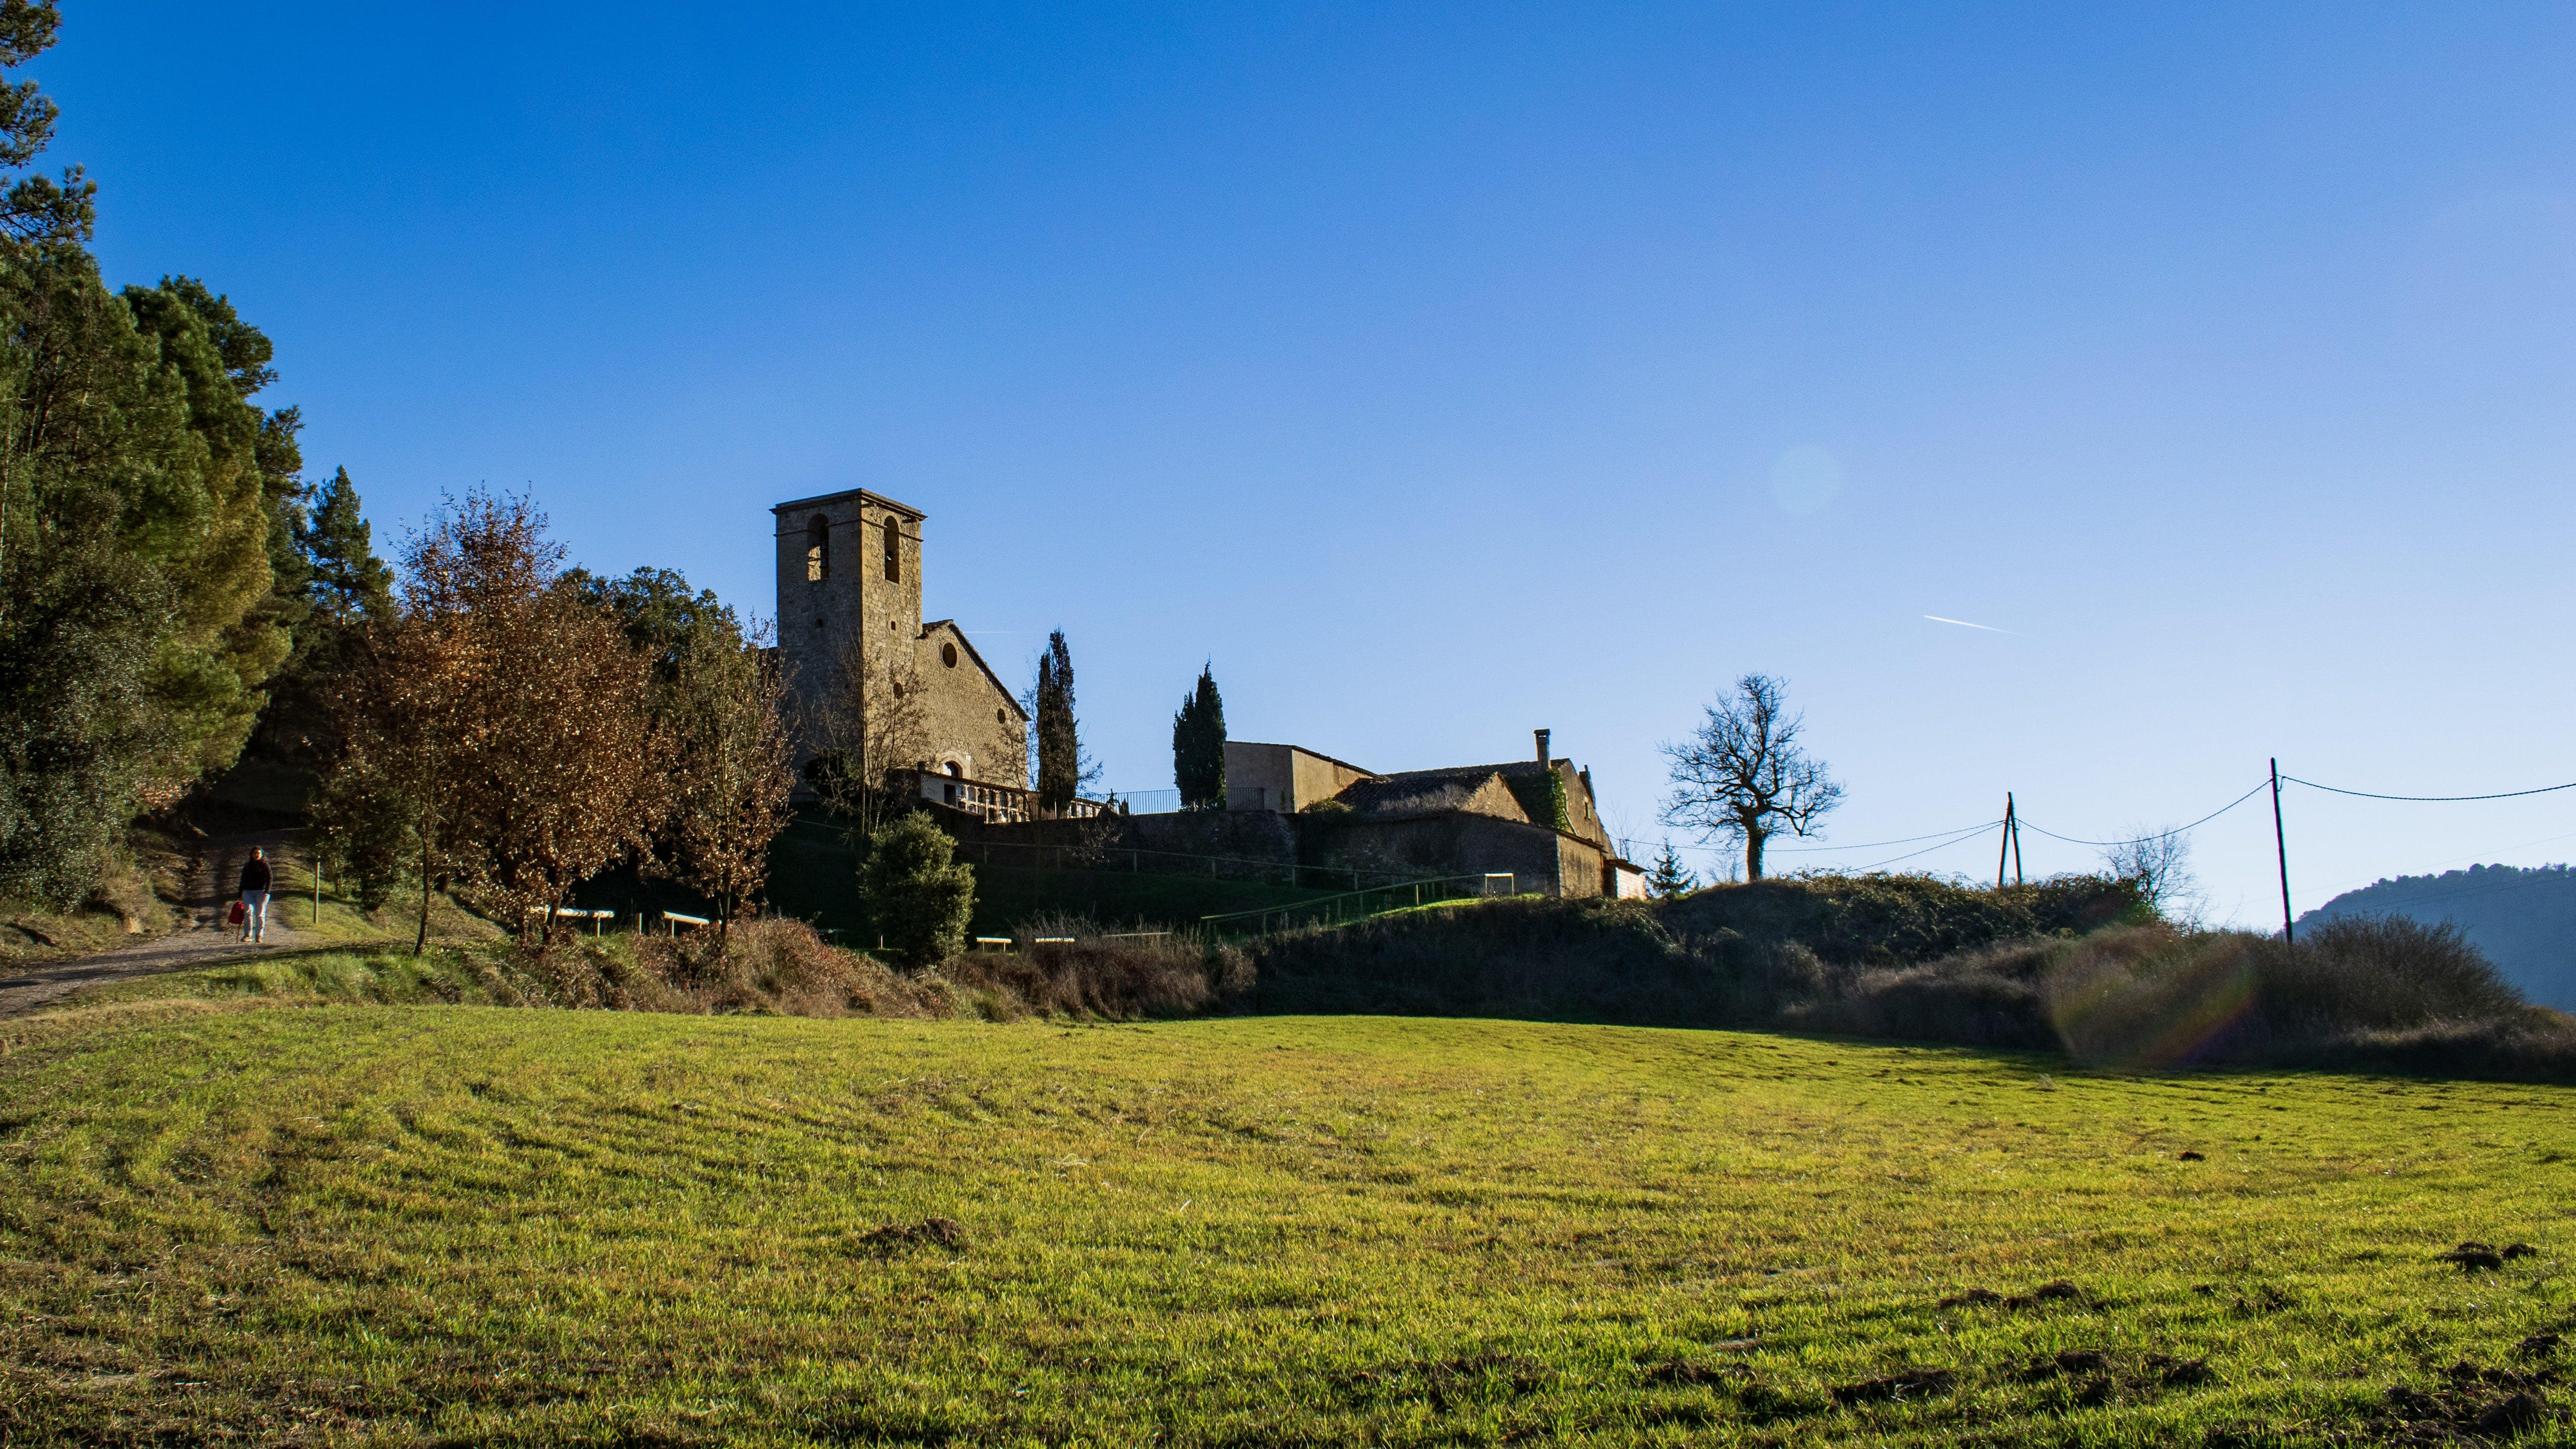 Free stock photo of church, monastery, rural area